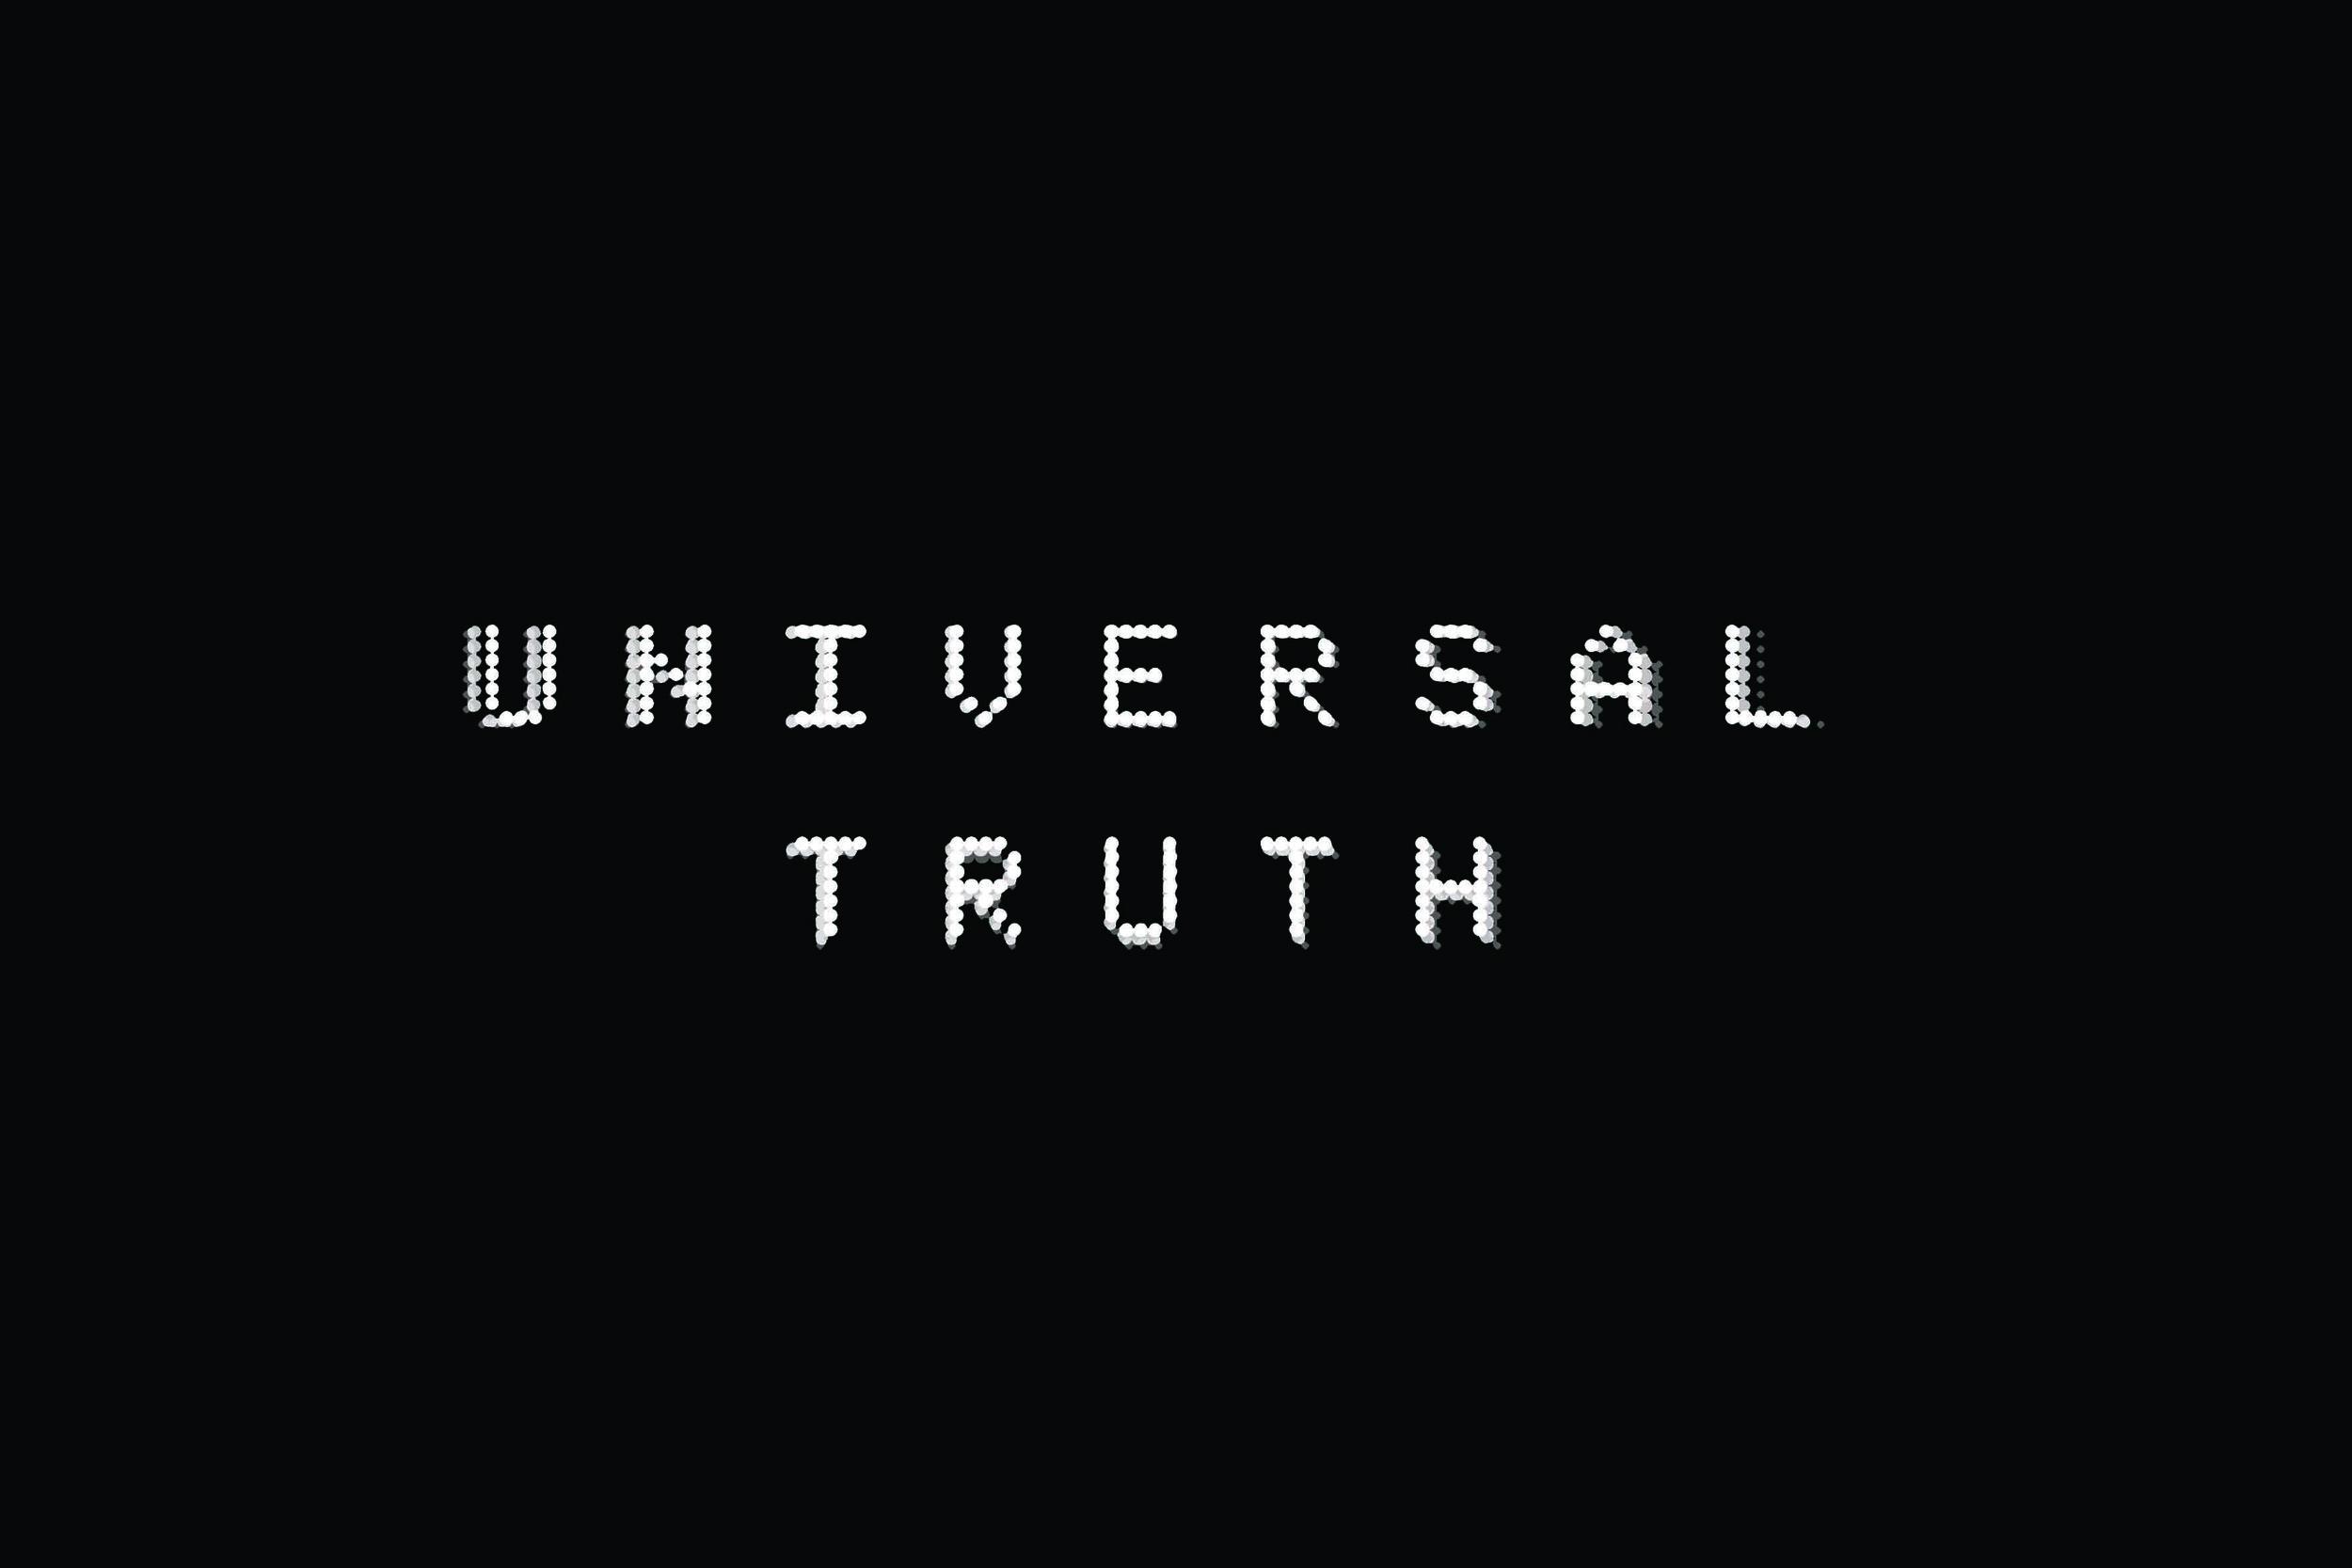 Michaela Gleave, Universal Truth , 2012, LED lights, 65 x 95cm